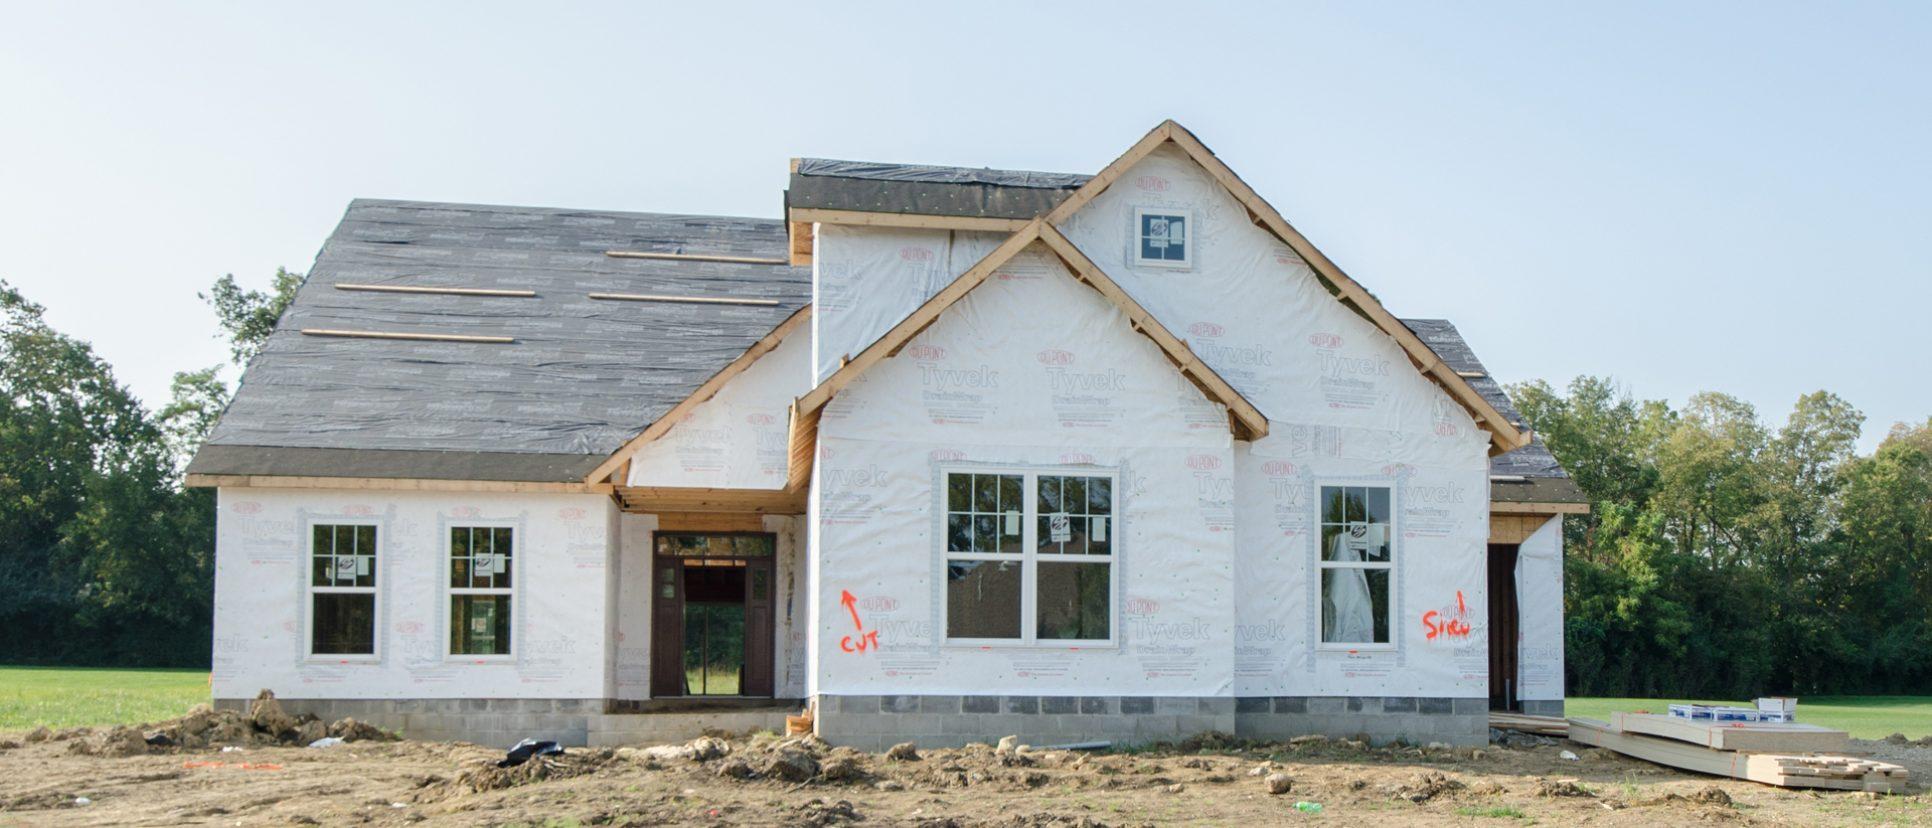 Custom exterior of The Jocelyn, under construction. Built by Design Homes.